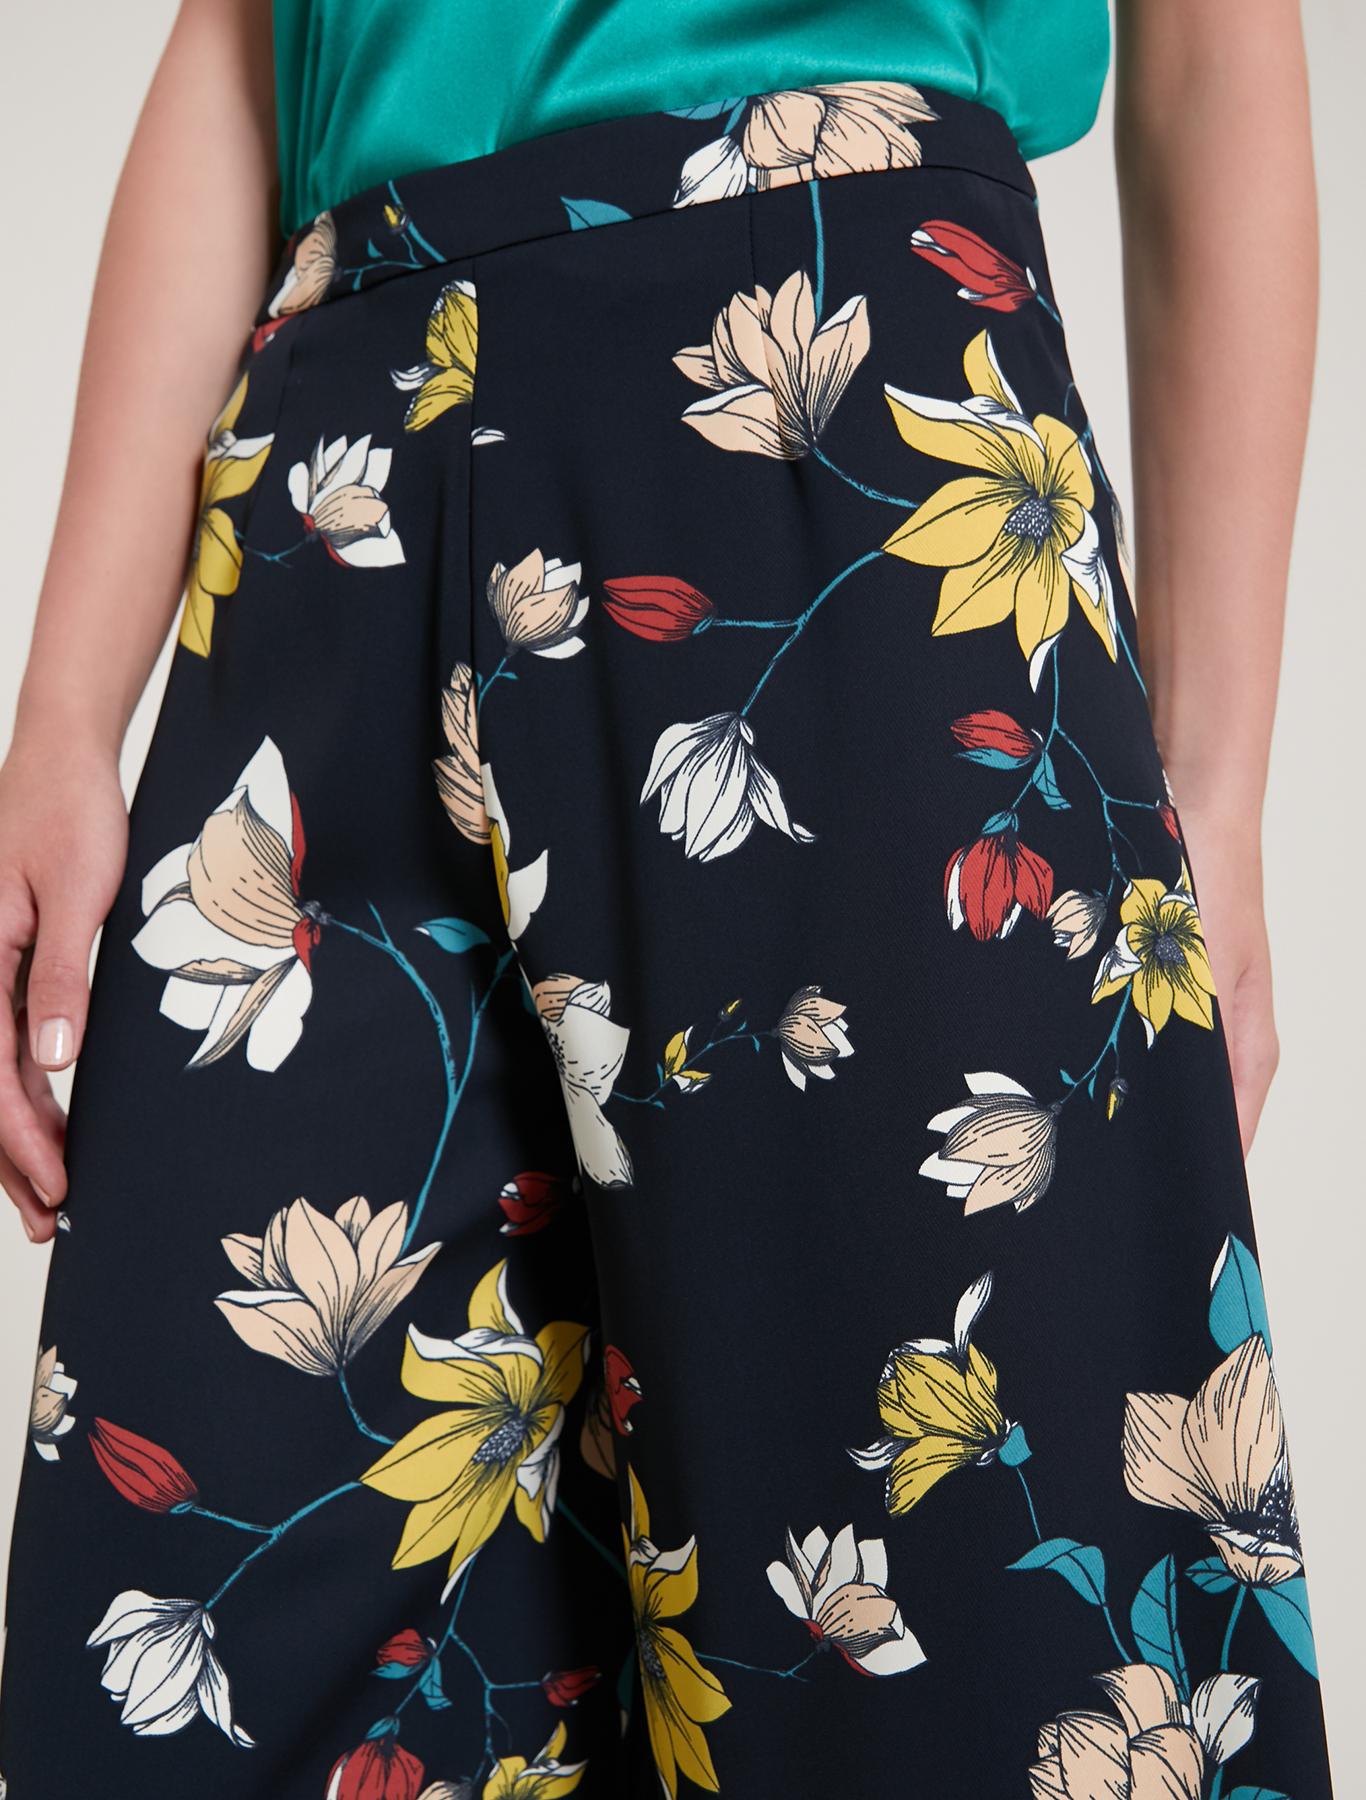 Floral cady culottes - navy blue pattern - pennyblack